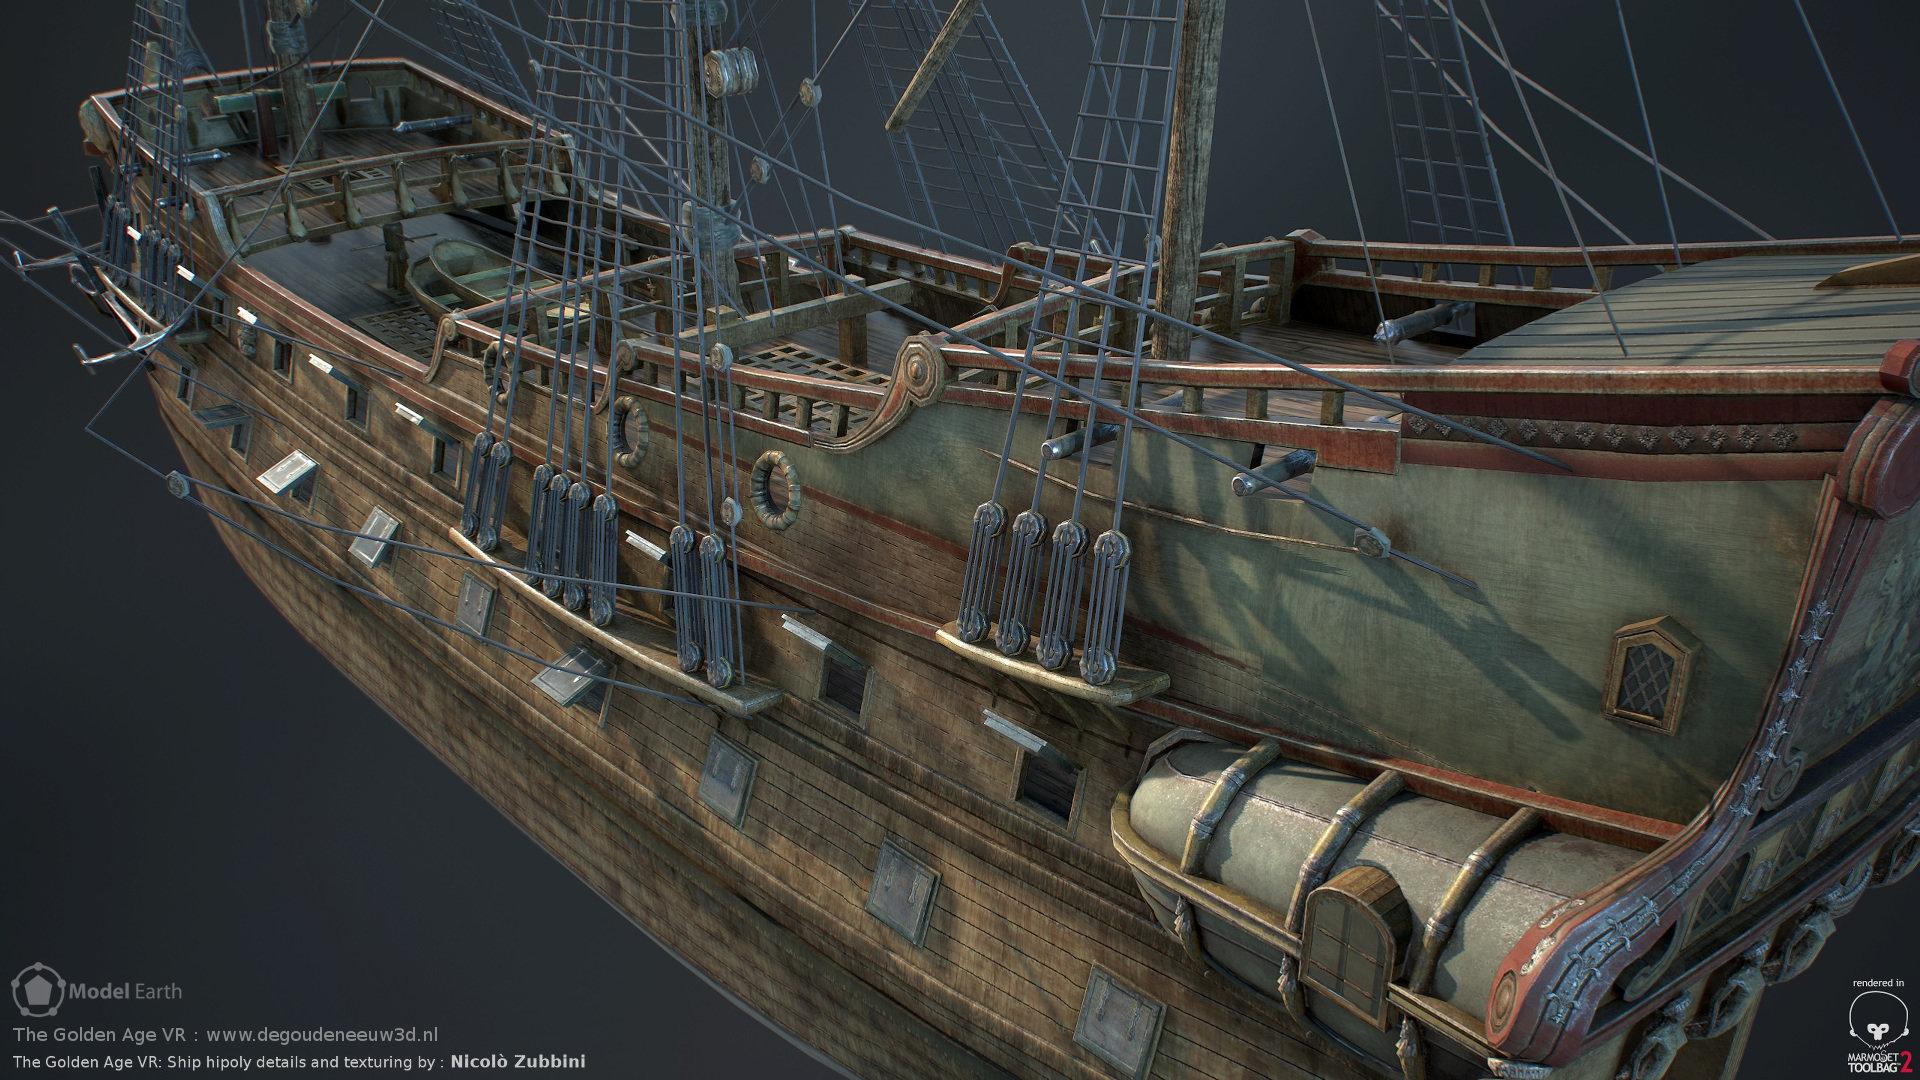 Nicolo zubbini gavr ship render3